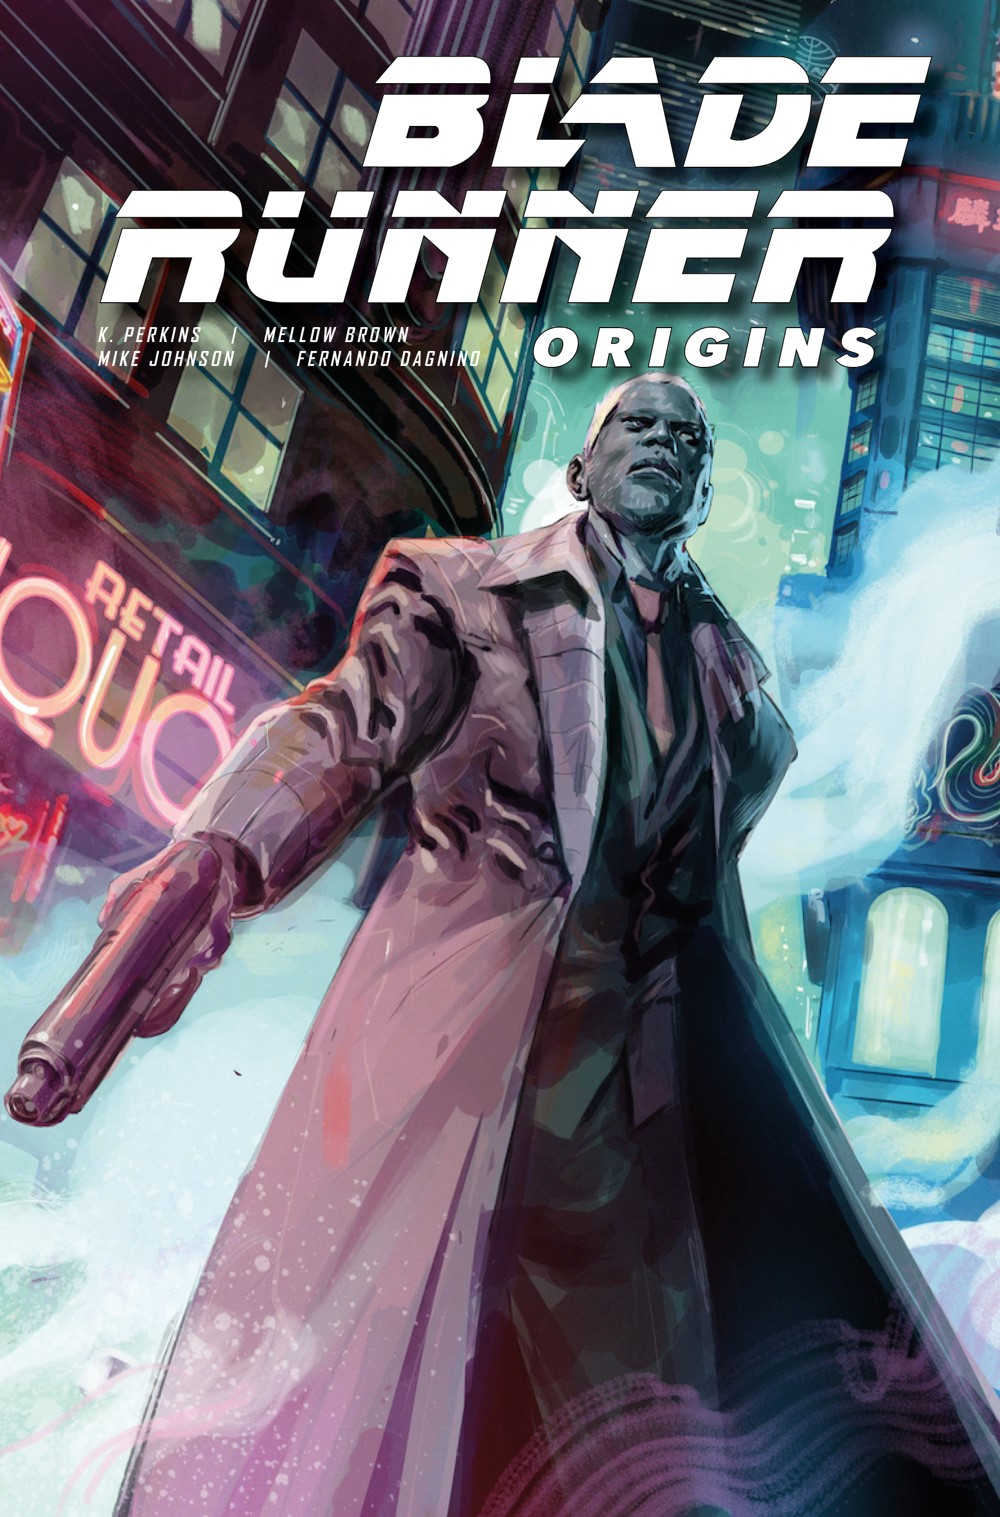 BLADE-RUNNER-ORIGINS-7-CVR-A-HERVAS Titan Comics October 2021 Solicitations